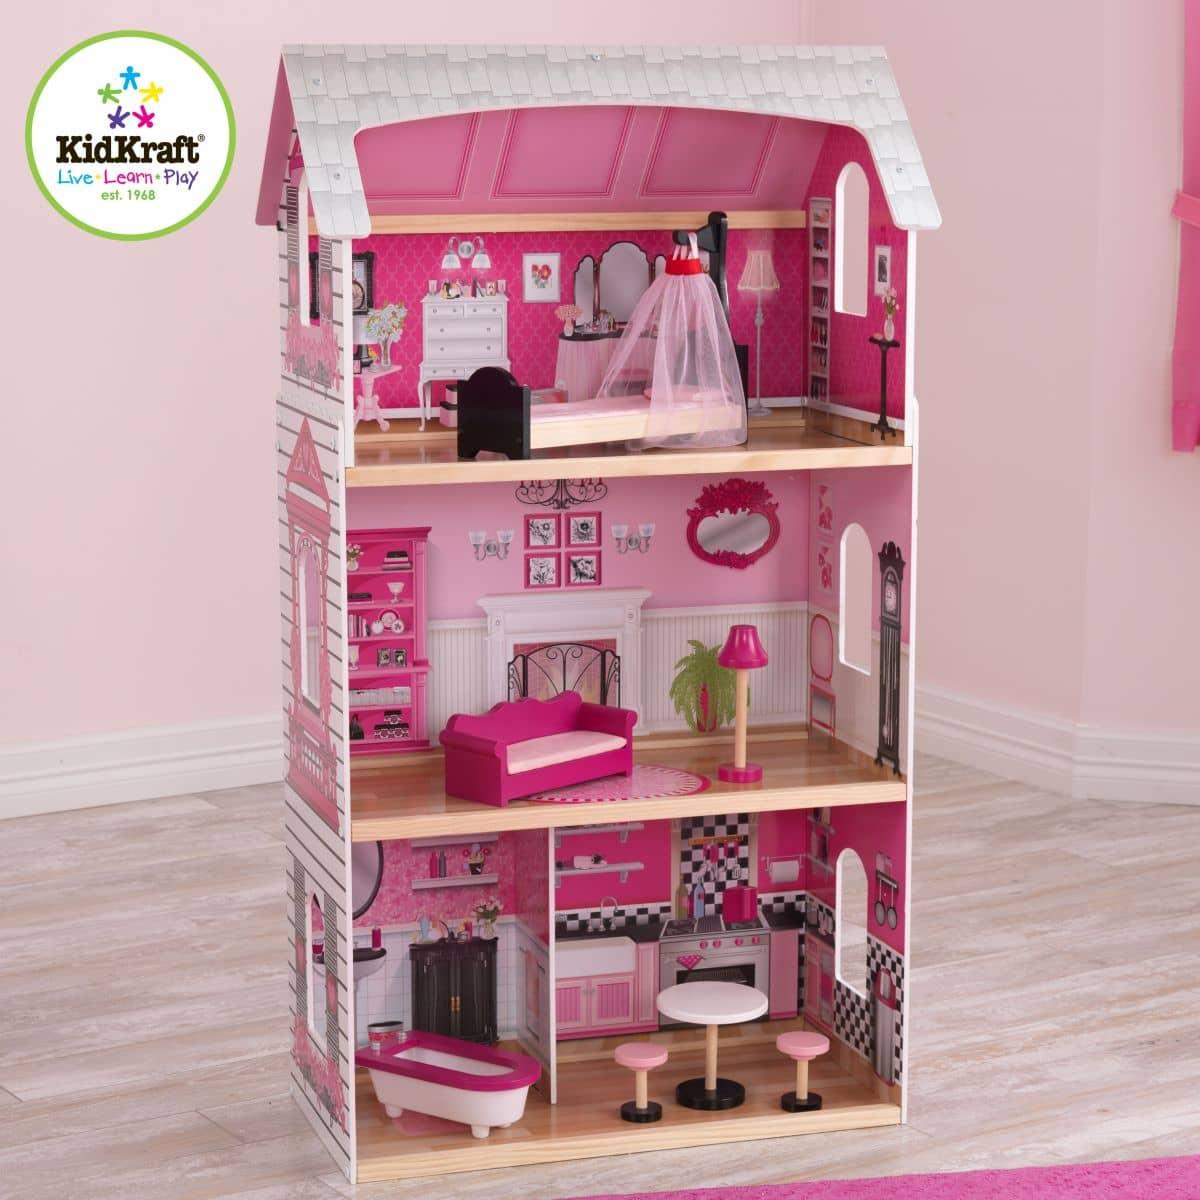 puppenhaus bonita rosa kidkraft g nstig online kaufen. Black Bedroom Furniture Sets. Home Design Ideas